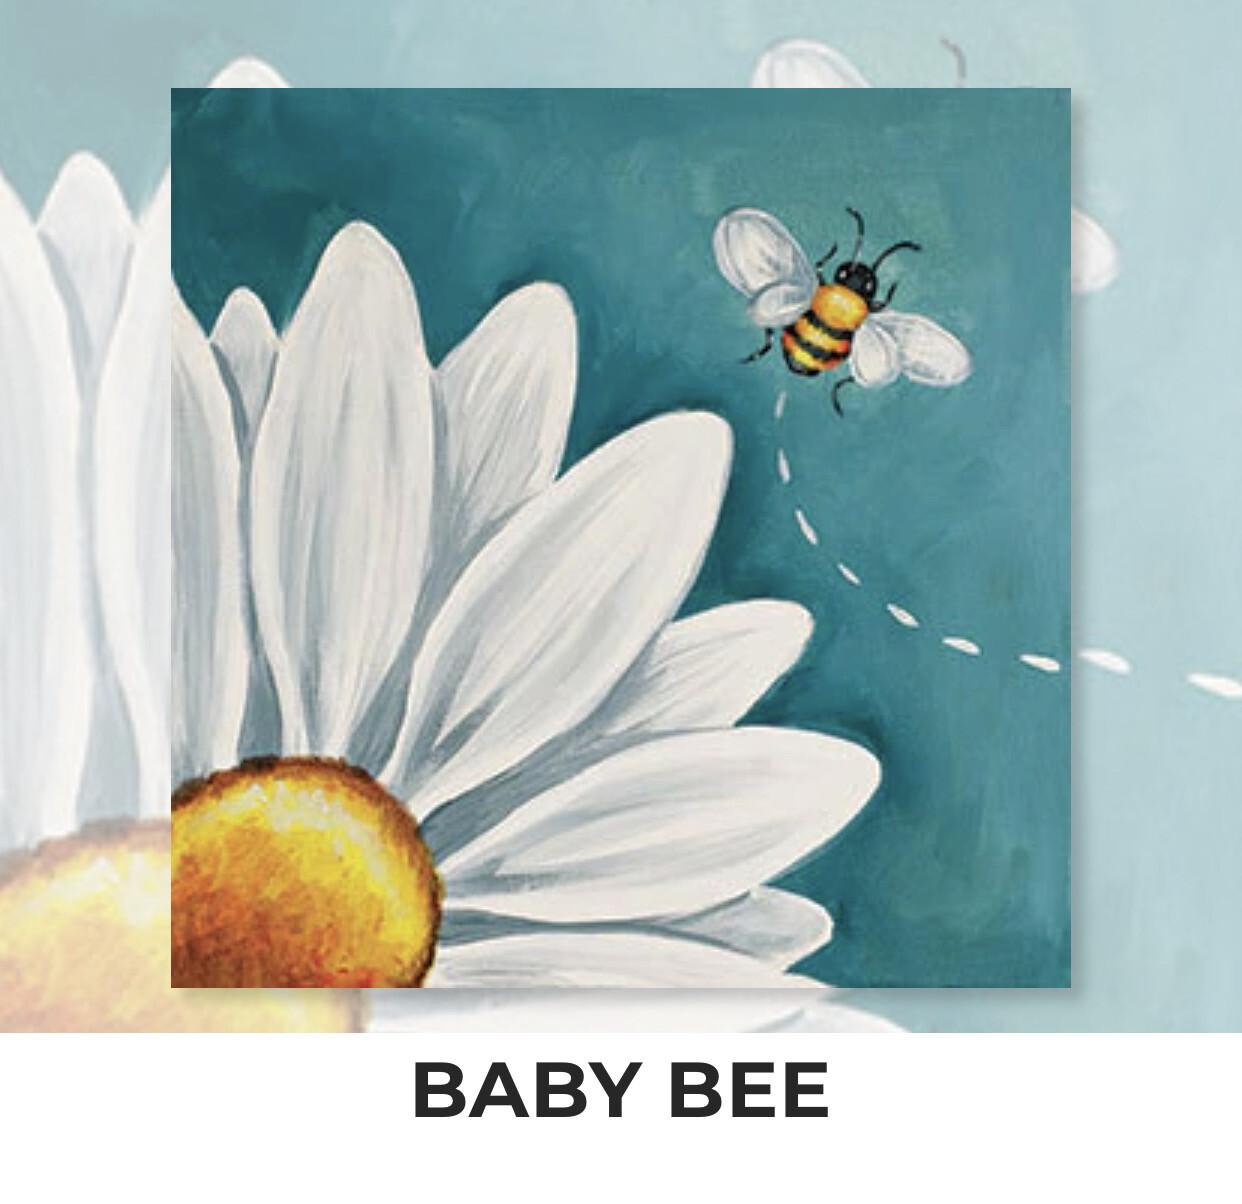 Baby Bee ADULT OR TWEEN Acrylic Paint On Canvas DIY Art Kit - 3 Week Special Order